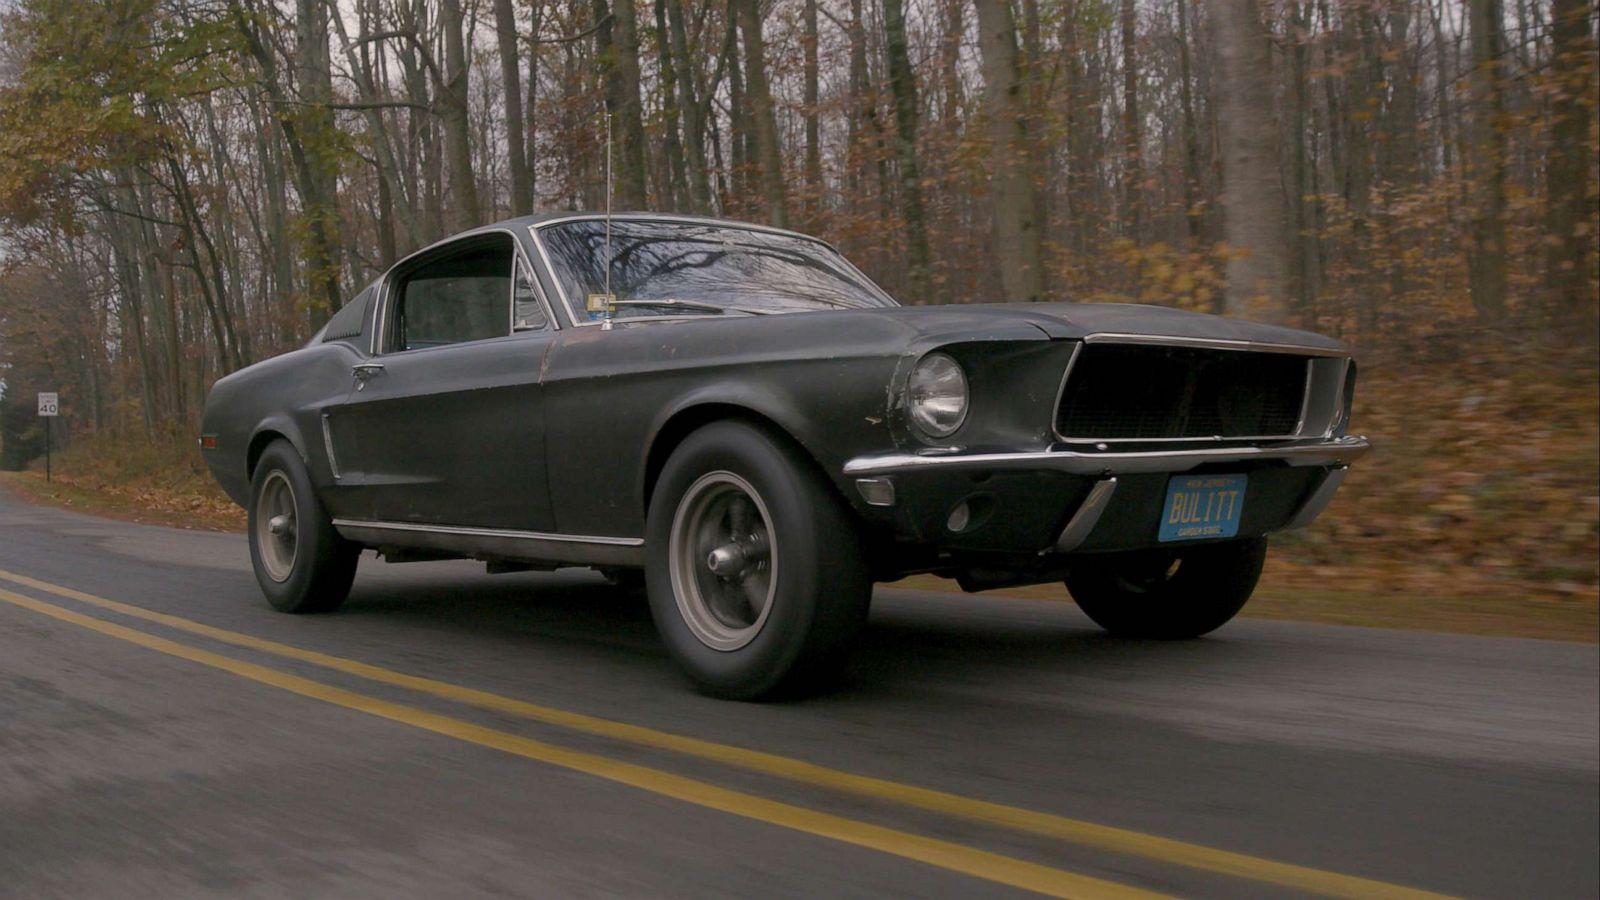 Mustang Made Famous In Steve Mcqueen Movie Bullitt Expected To